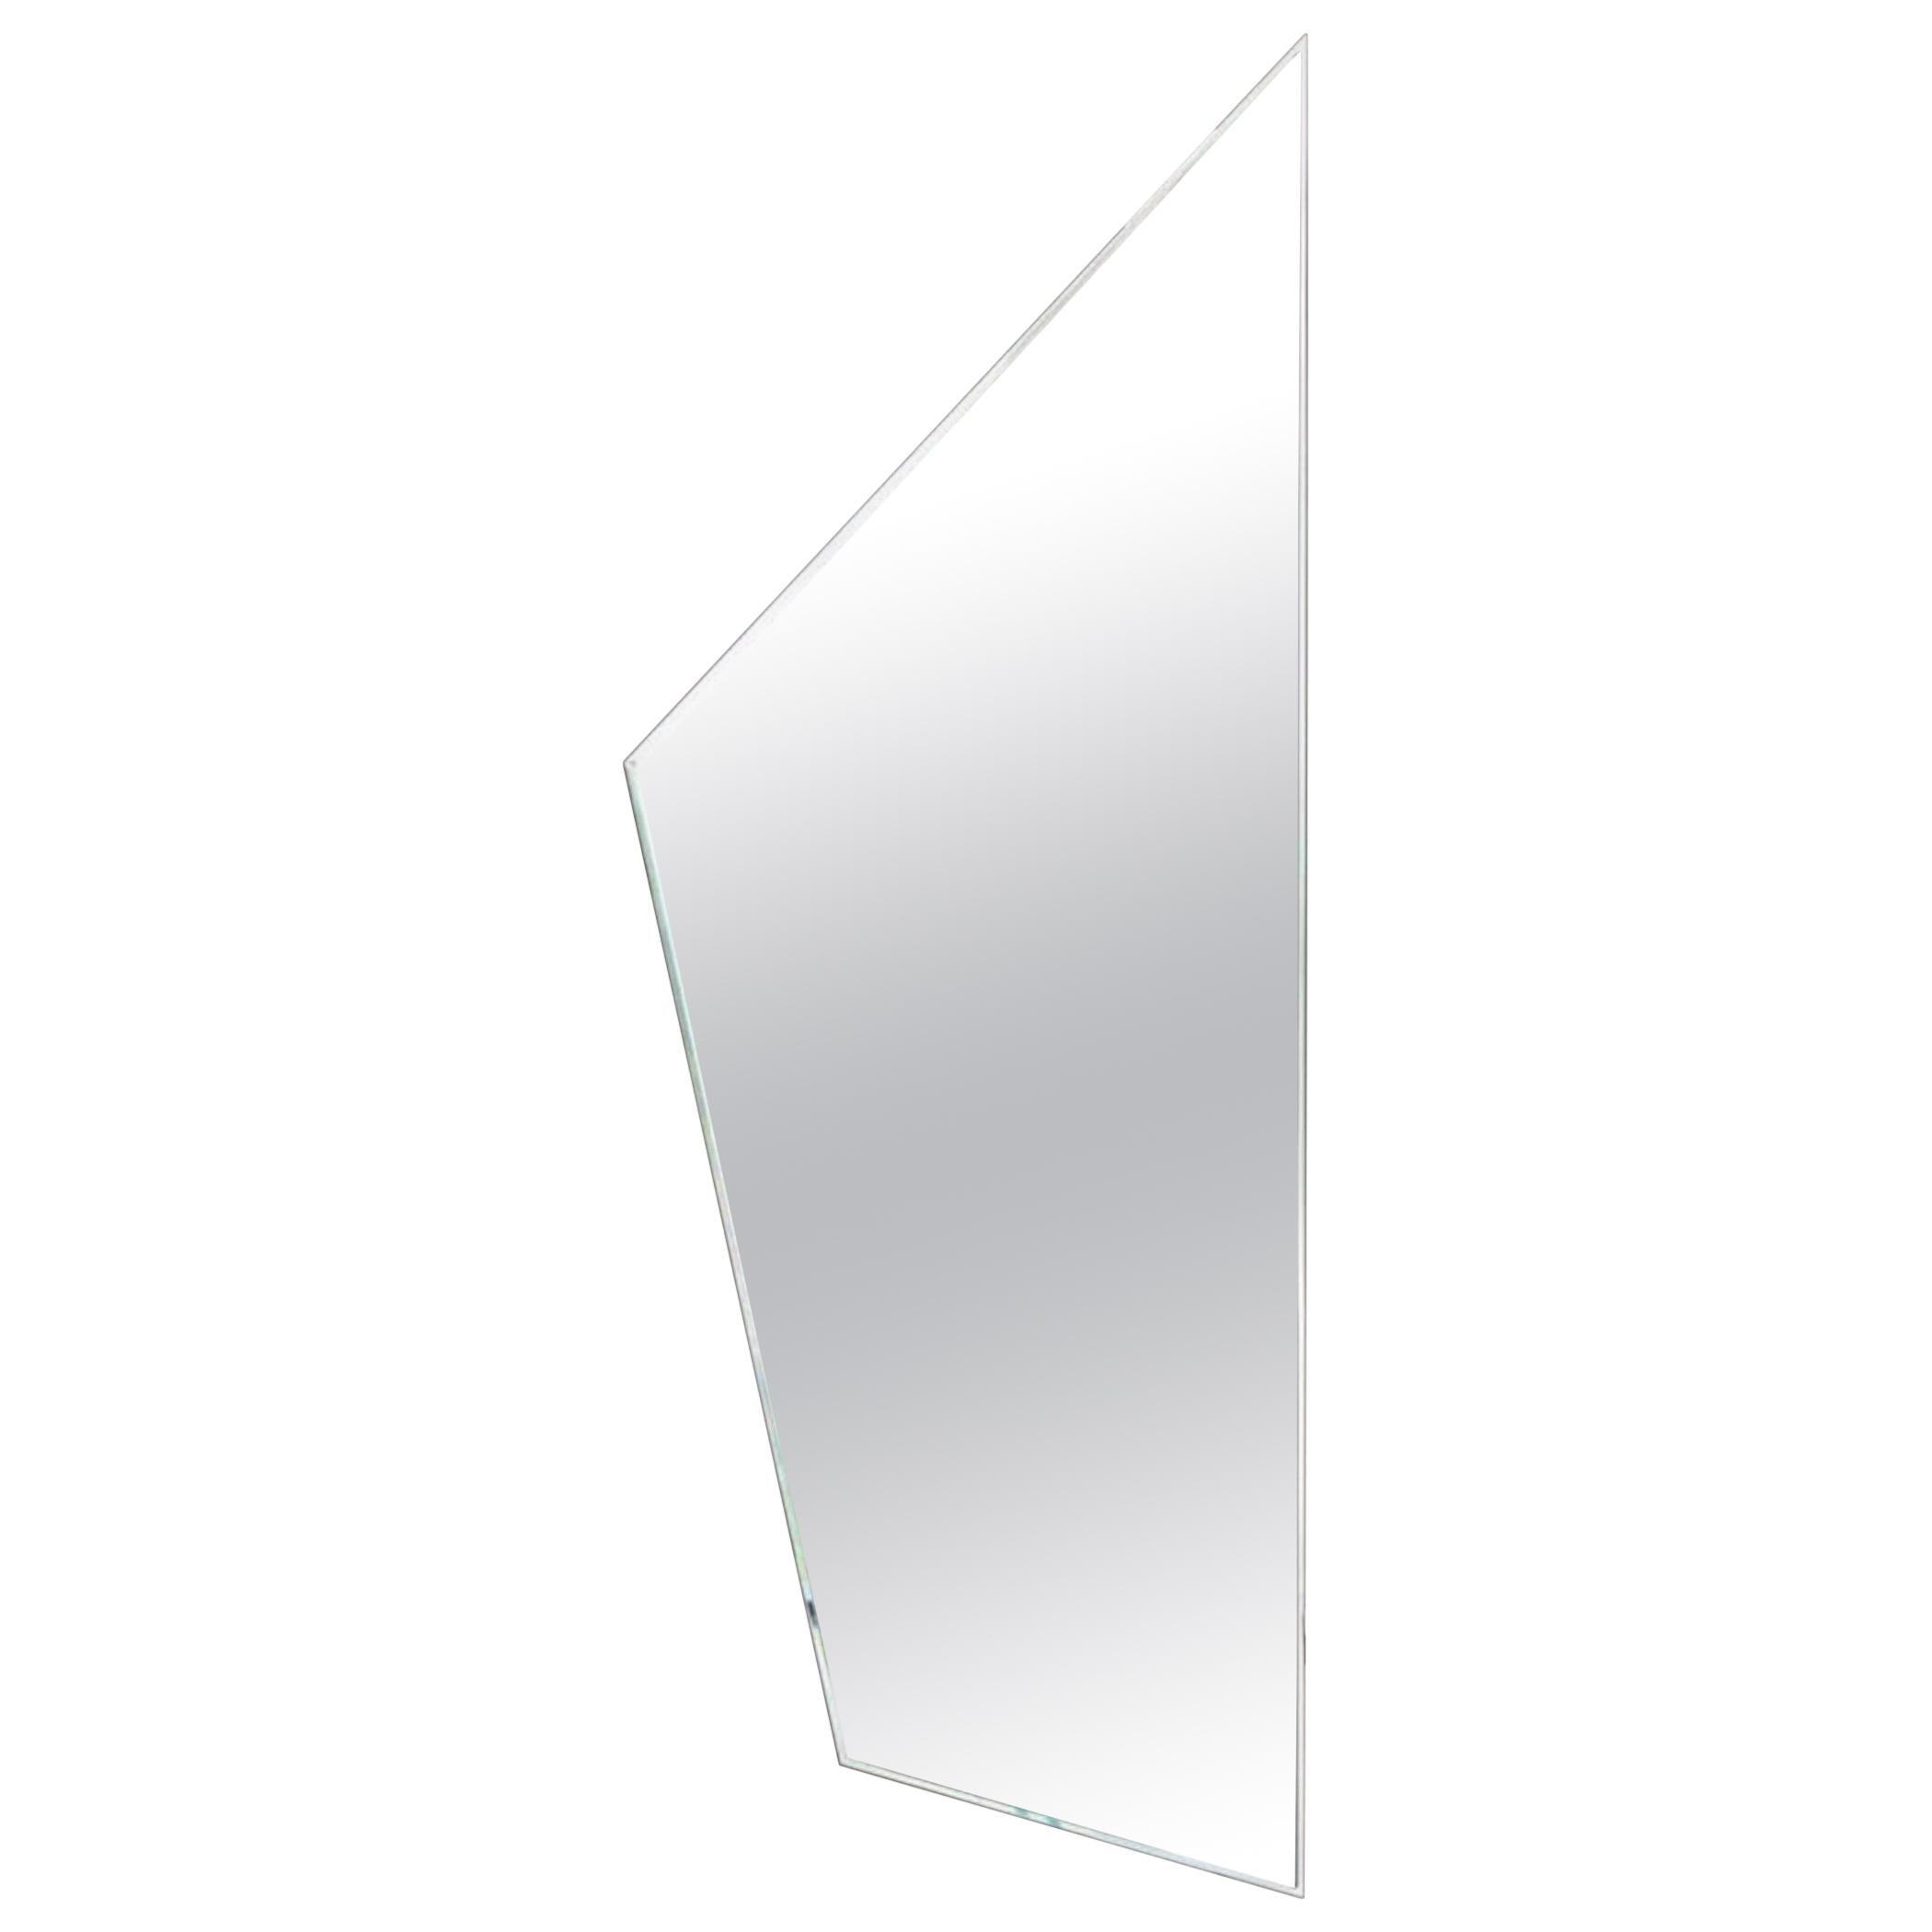 Fiam Mirage MI/A Wall Mirror in Glass, by Daniel Libeskind